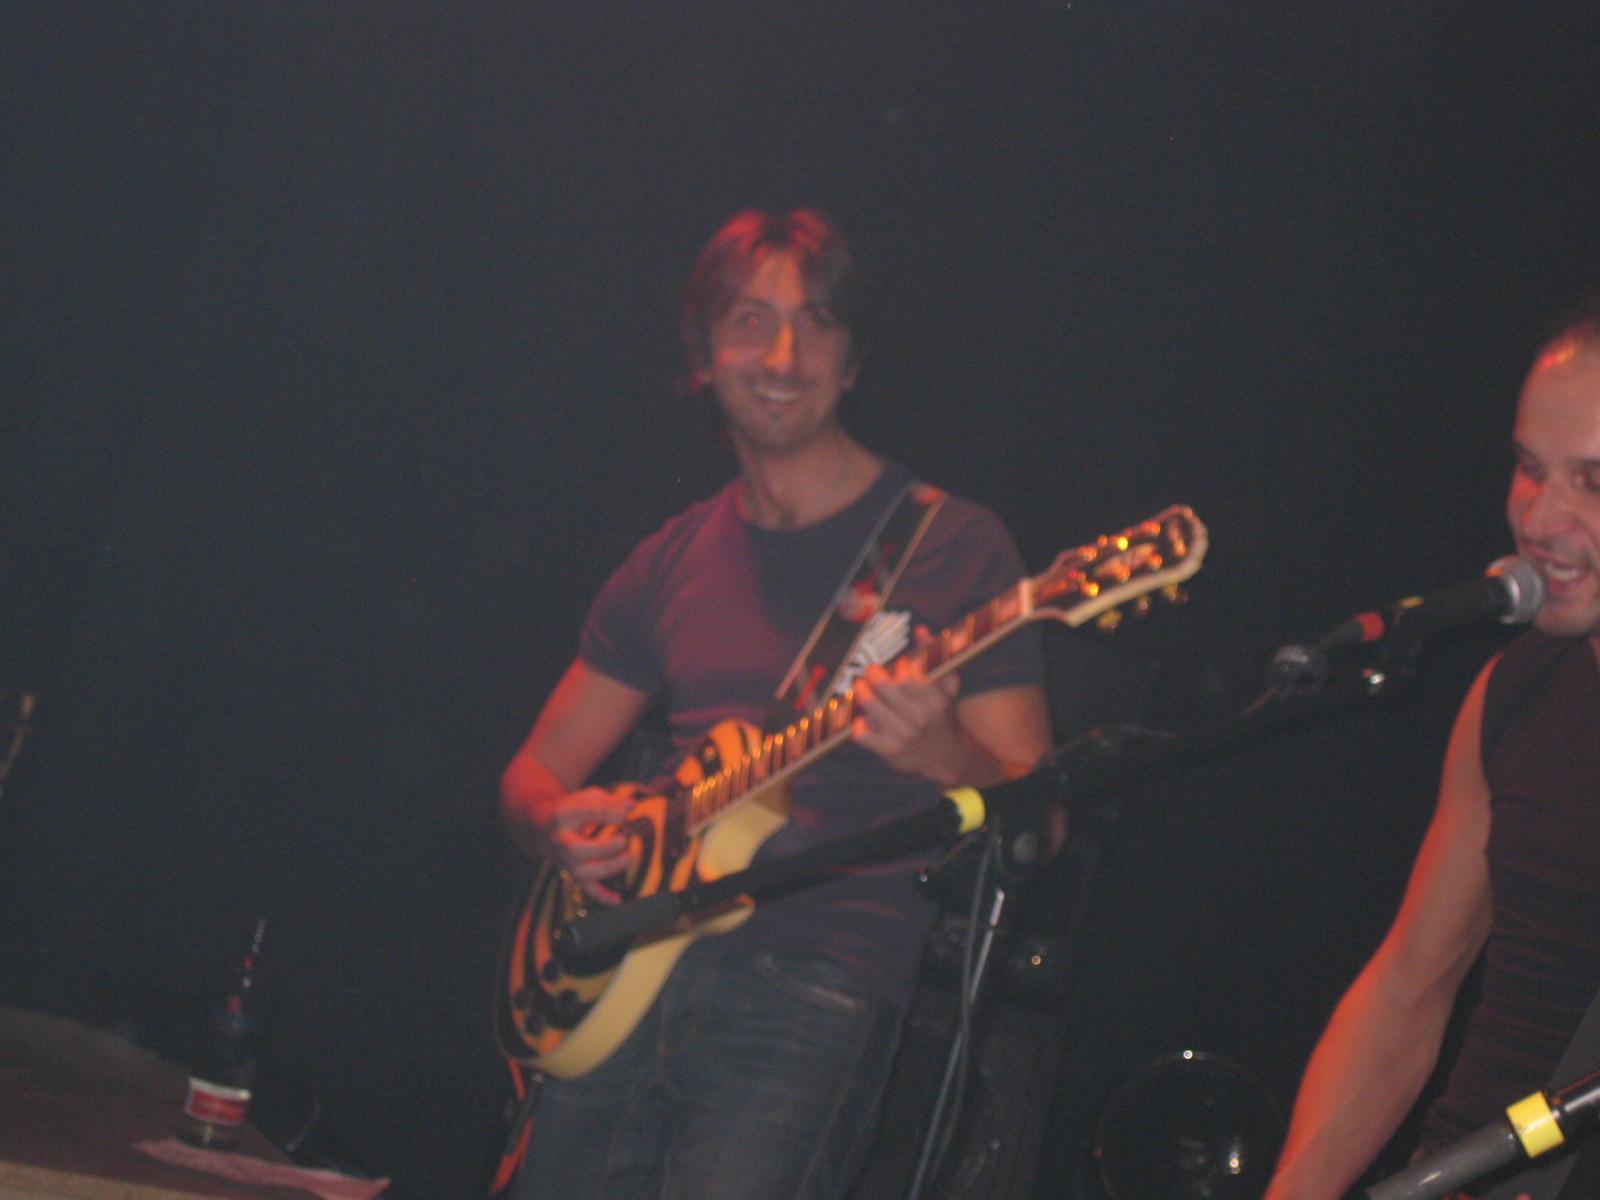 Live@Met Bar, Lenzburg, Switzerland - 17.10.2009